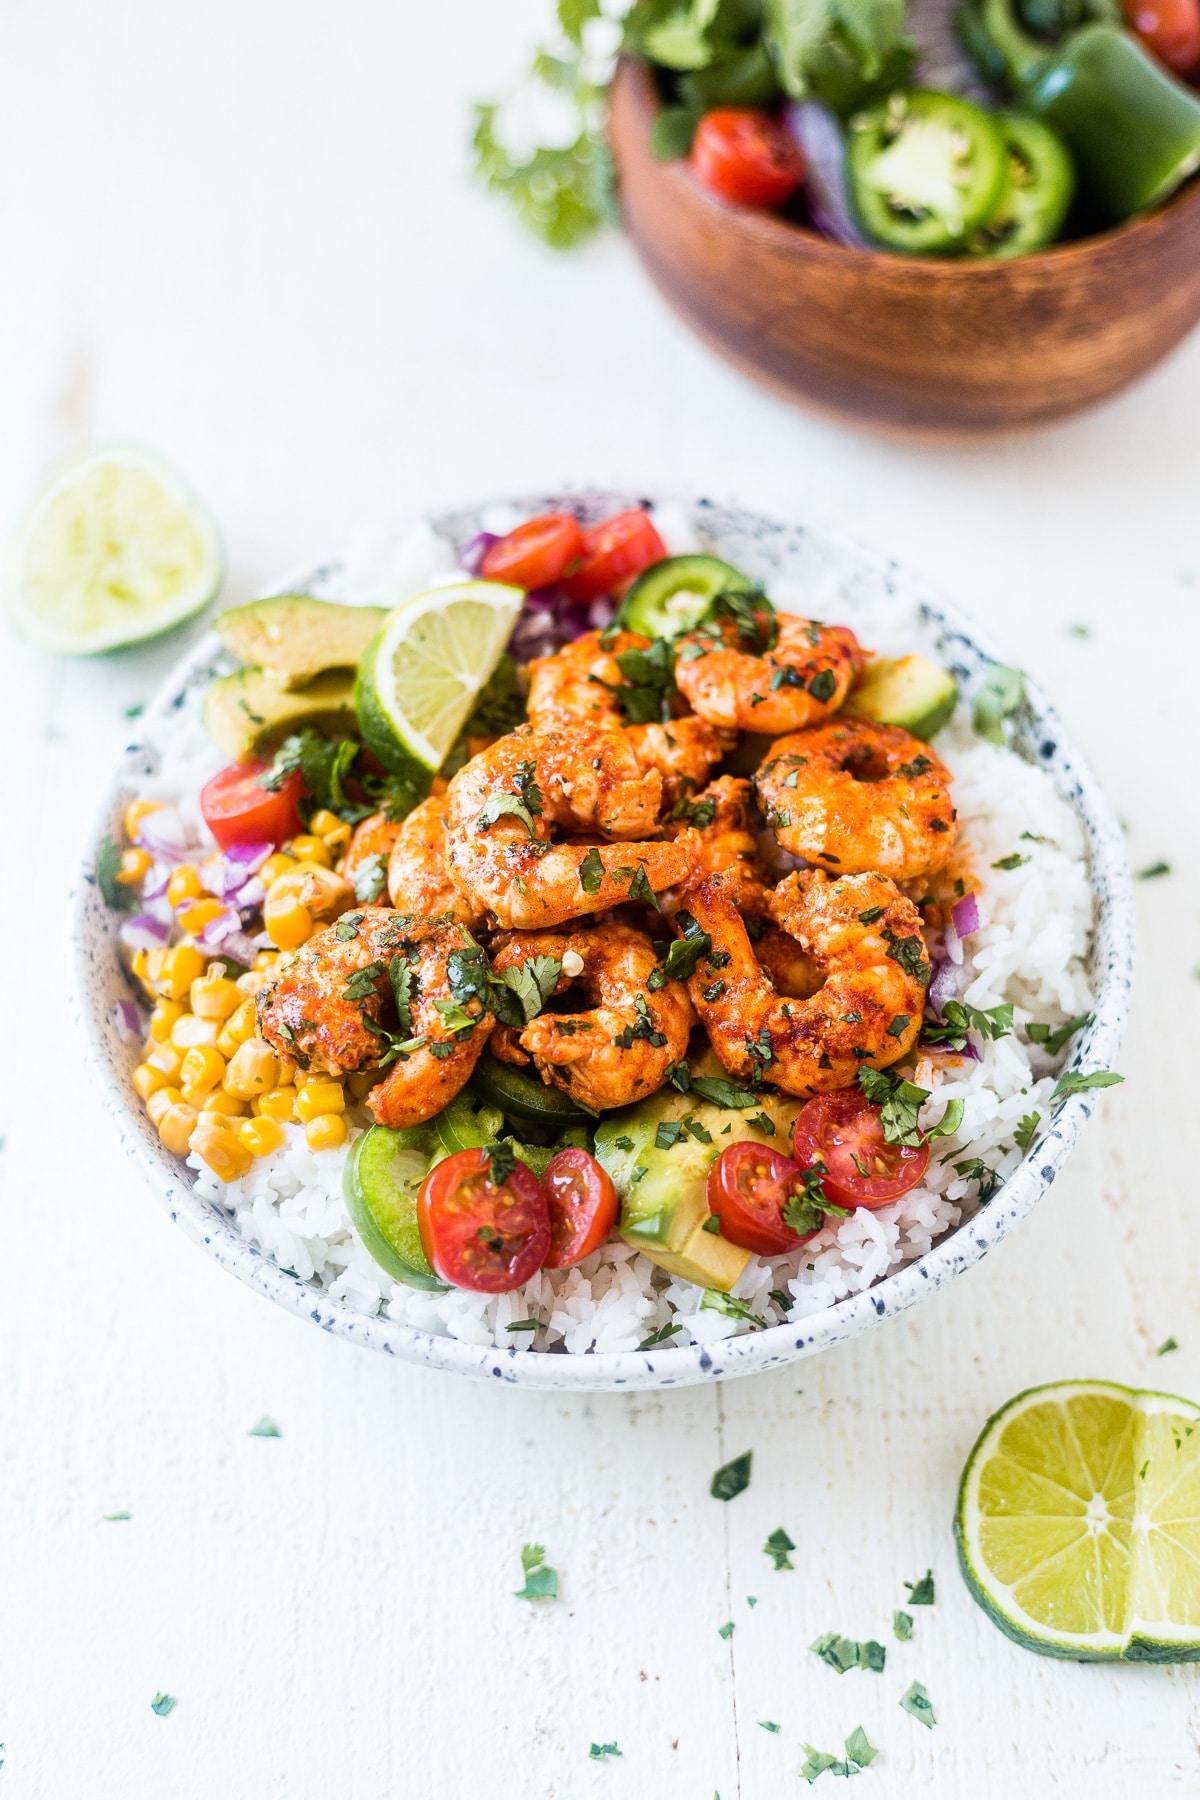 shrimp bowl with white rice and topped with fiesta shrimp, avocado, corn, tomatoes, avocado and fresh cilantro